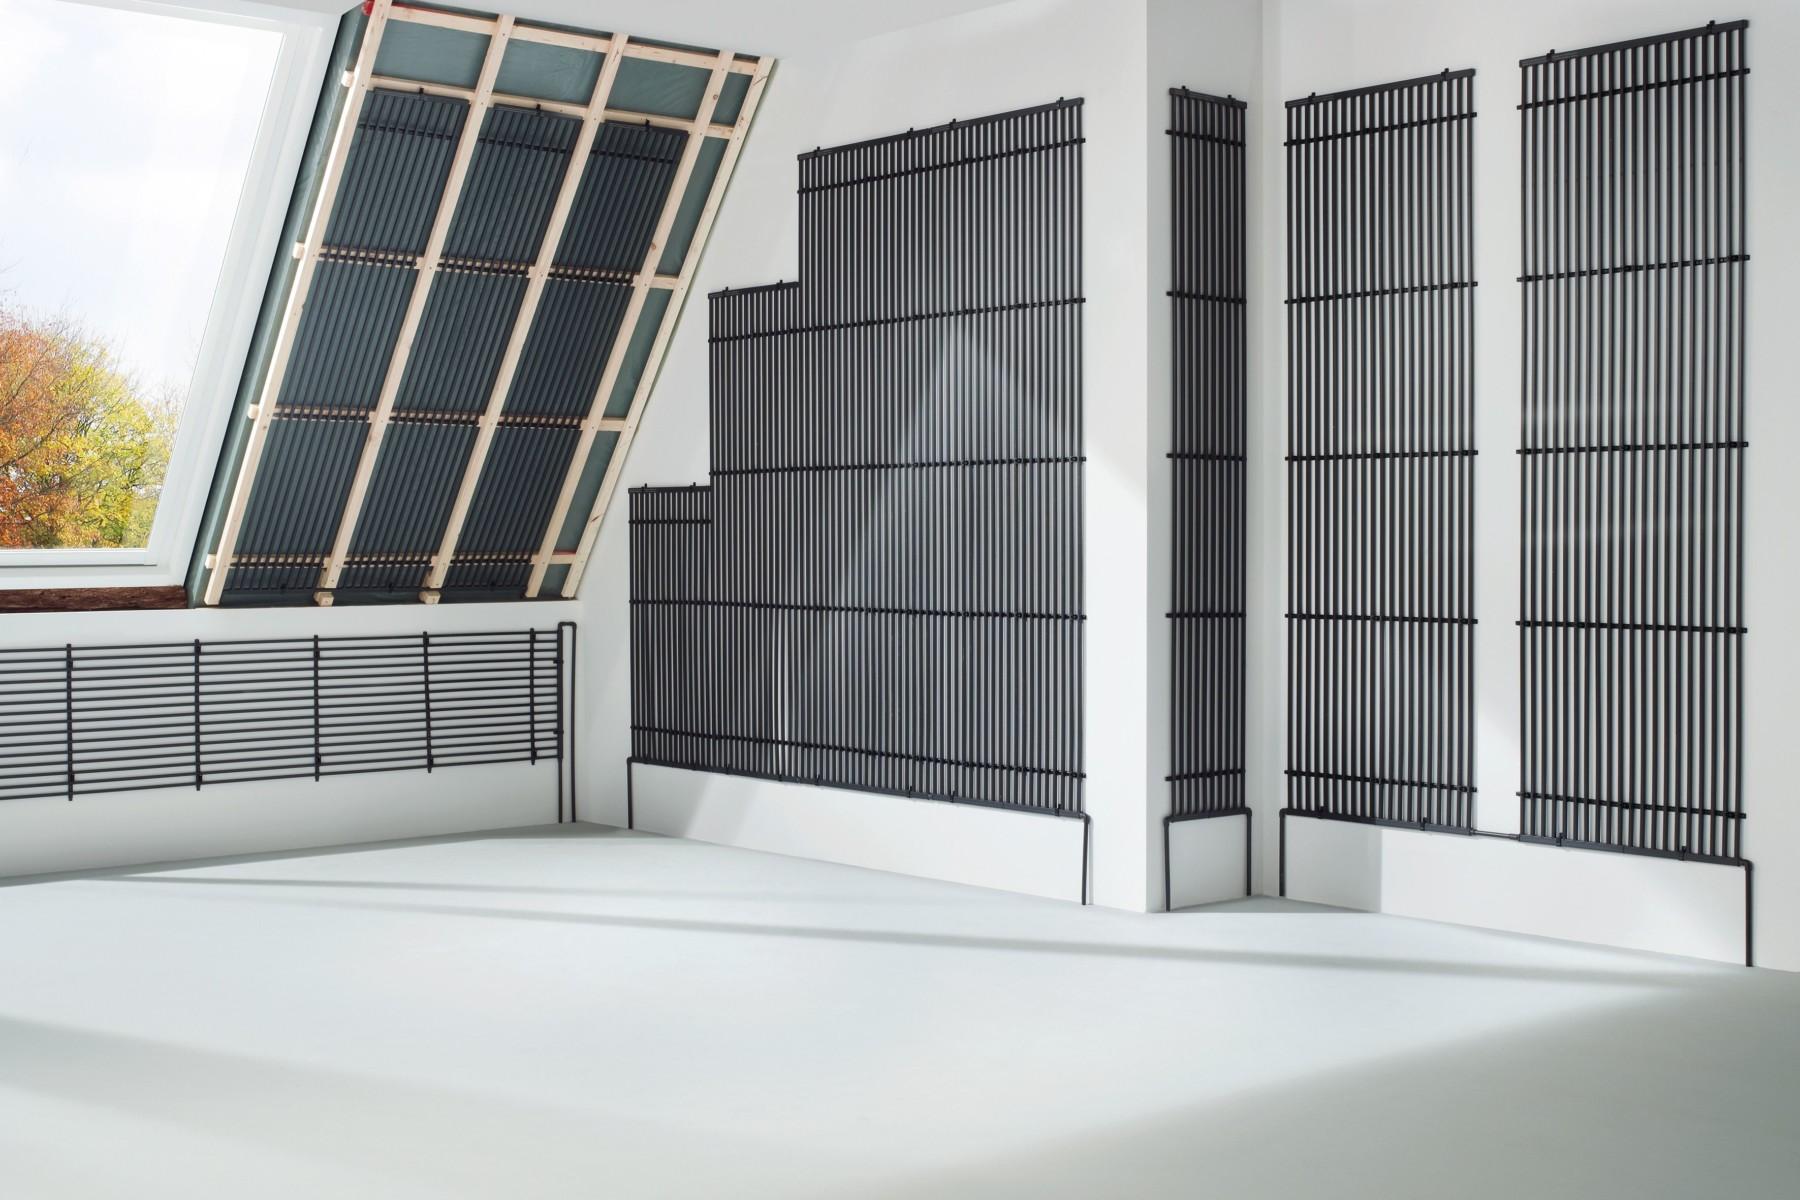 Dachgeschoss heizen und kühlen - BVF